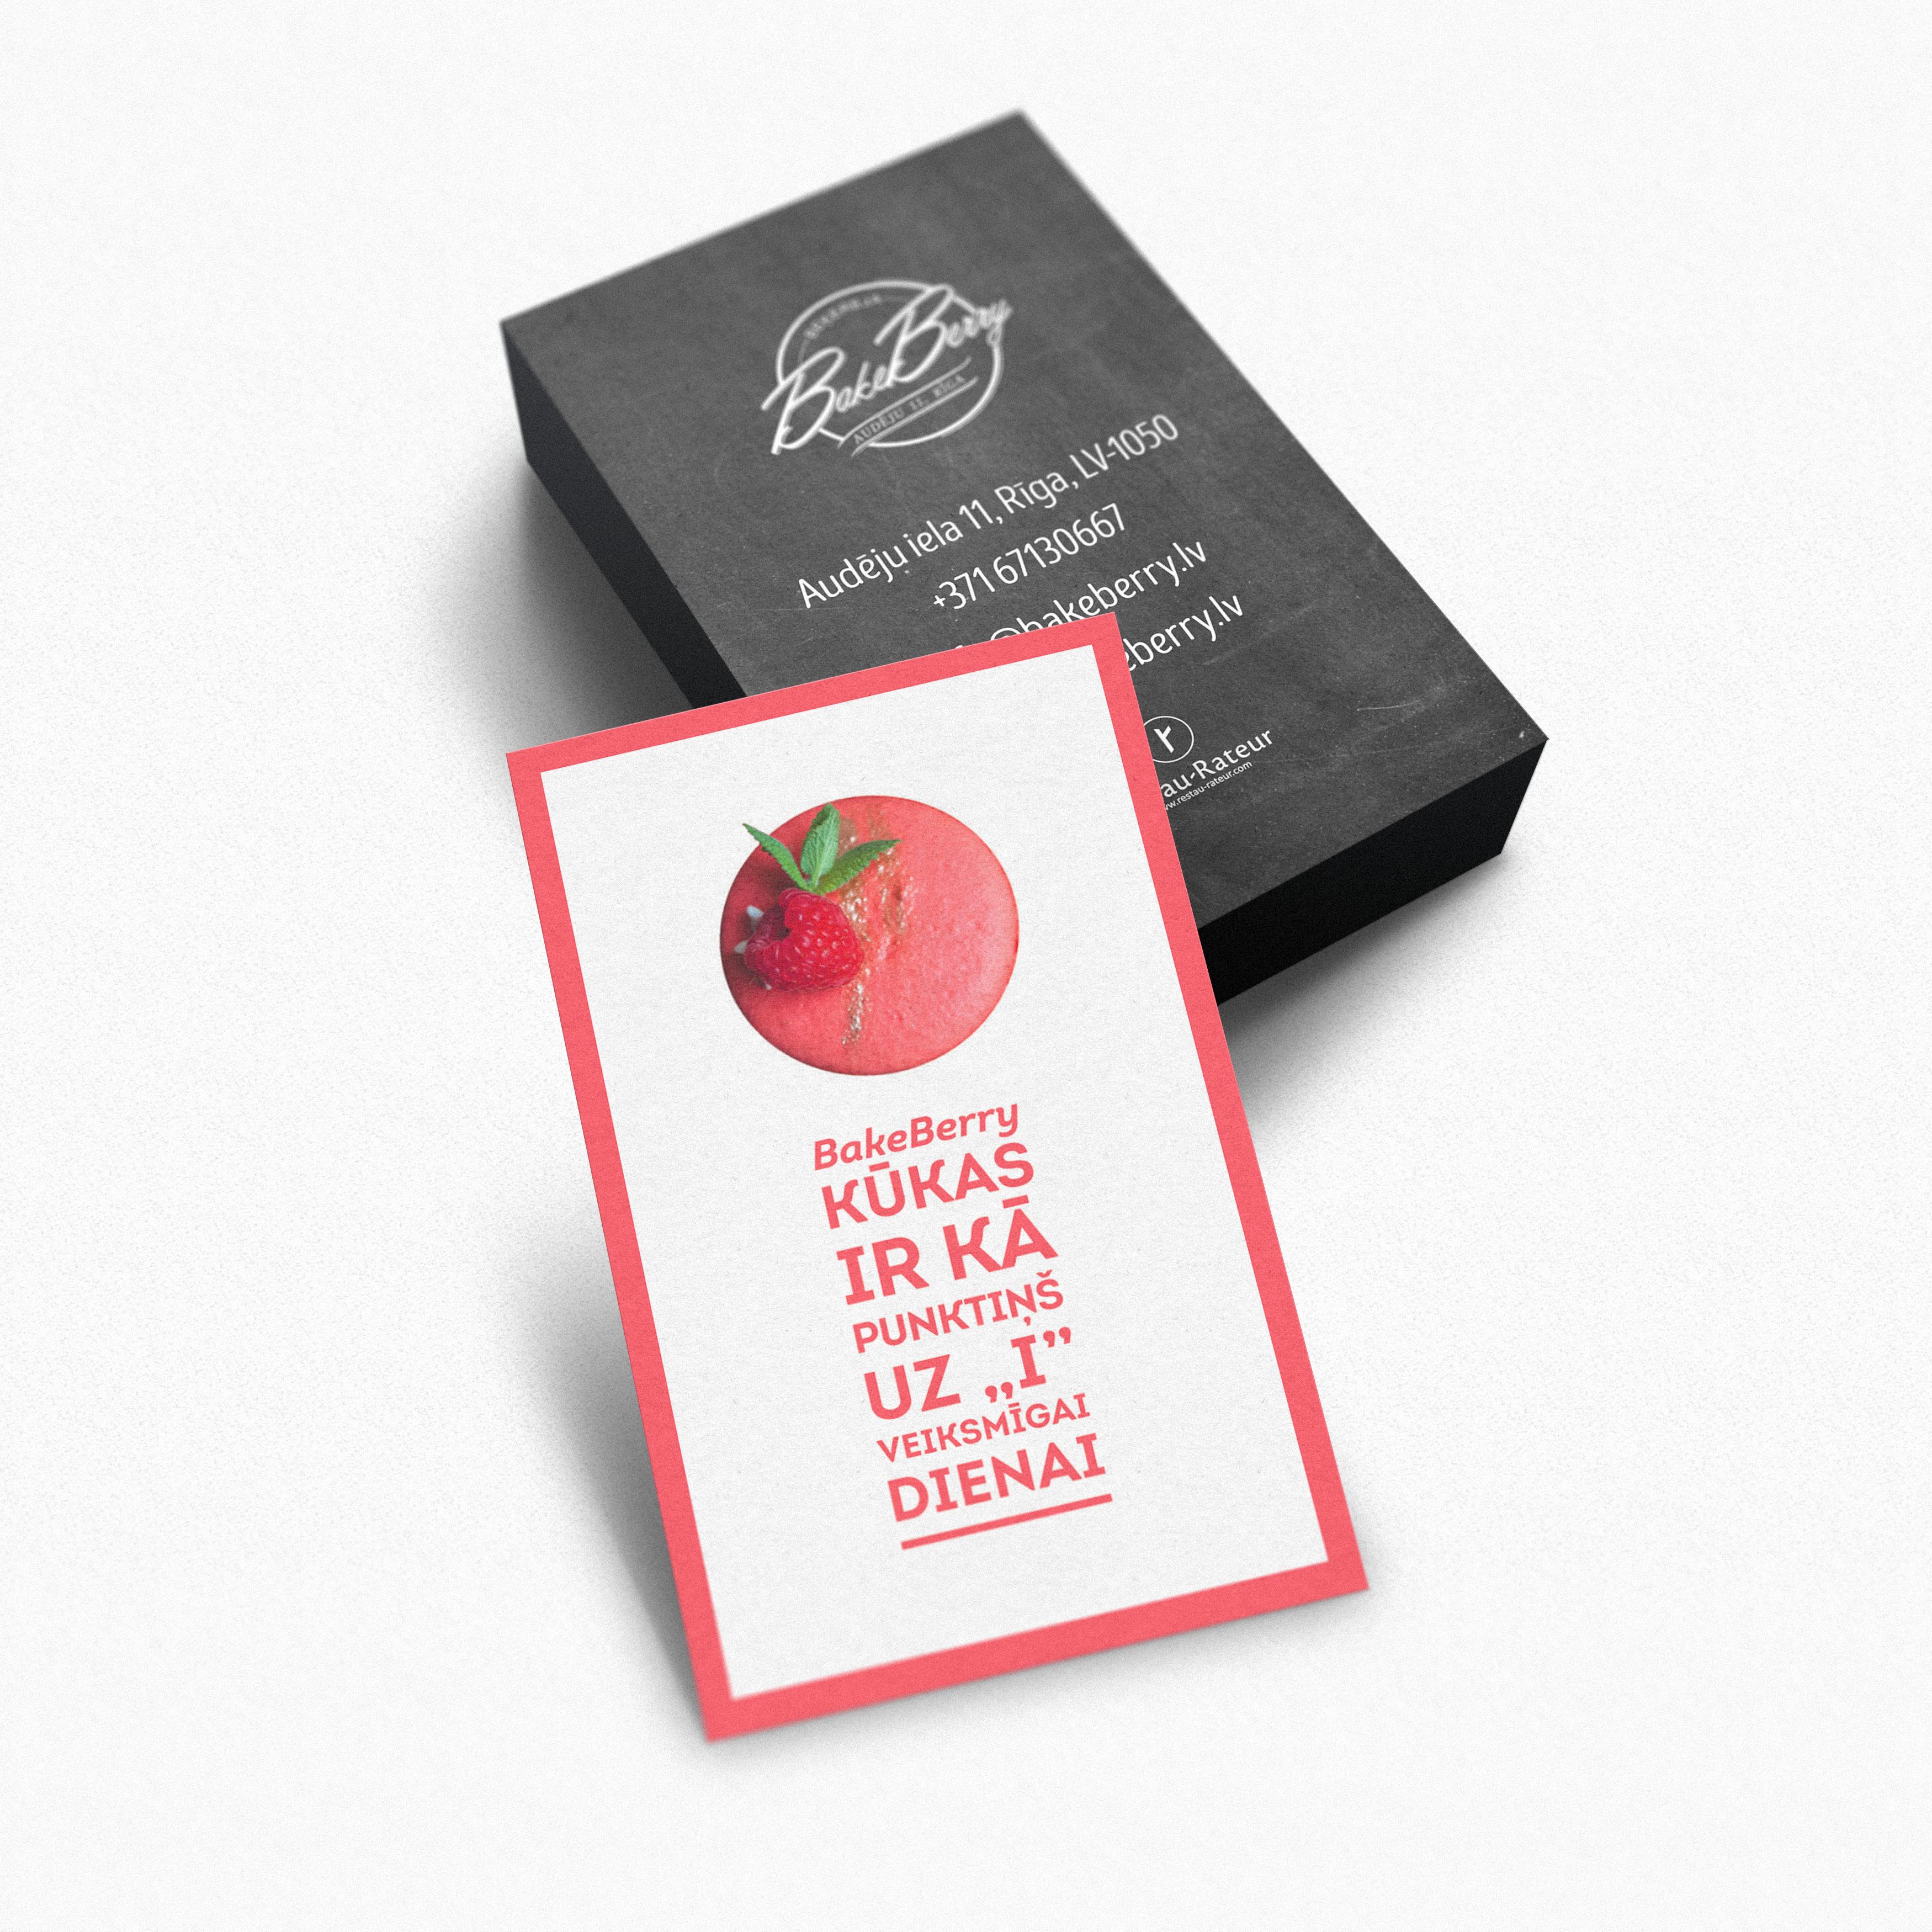 Edvards Percevs - Business card for cake shop \